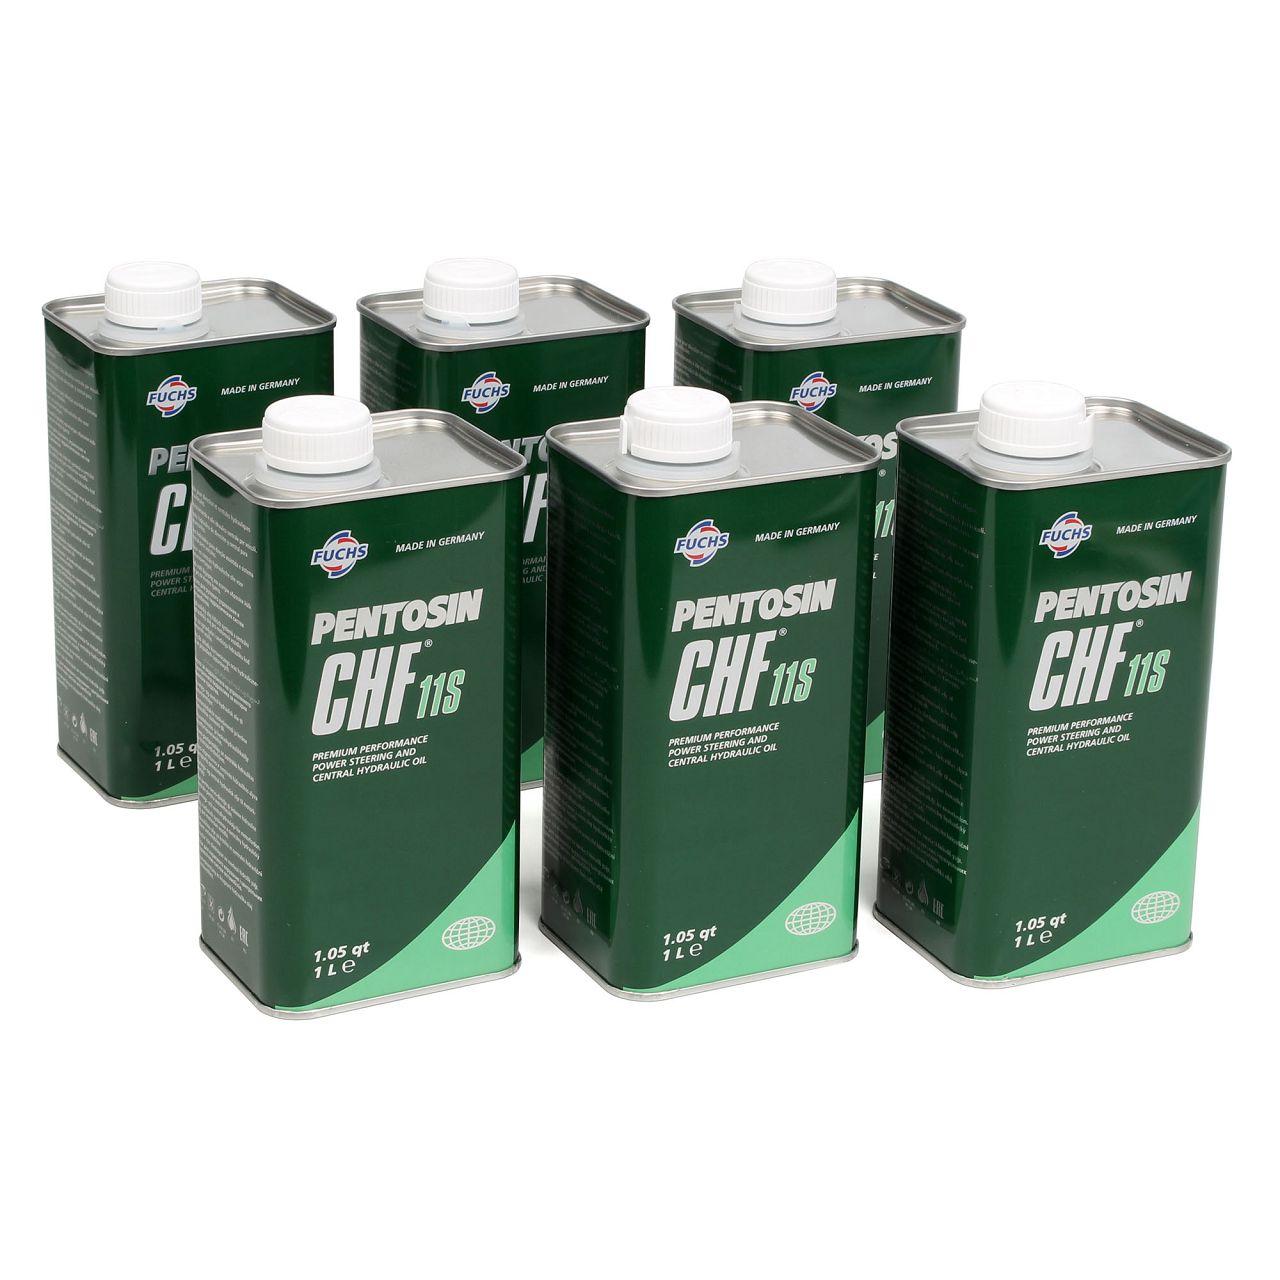 6x 1L 6 Liter PENTOSIN Hydrauliköl Servolenkungsöl CHF 11S MB 0019892403